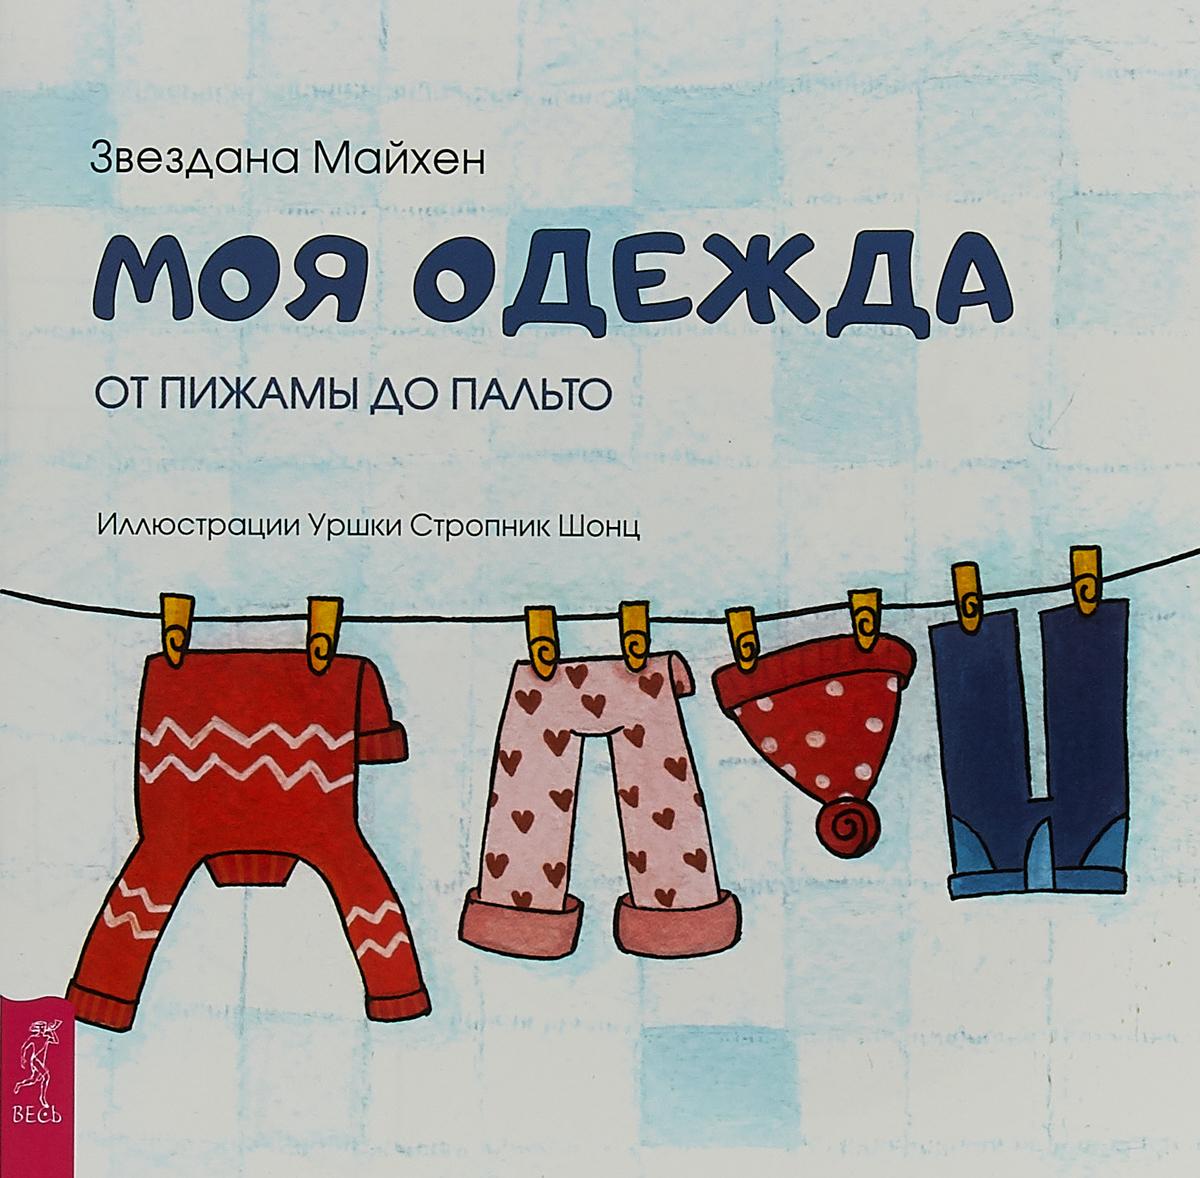 Звездана Майхен Моя одежда. От пижамы до пальто звездана майхен моя одежда от пижамы до пальто 2 шт